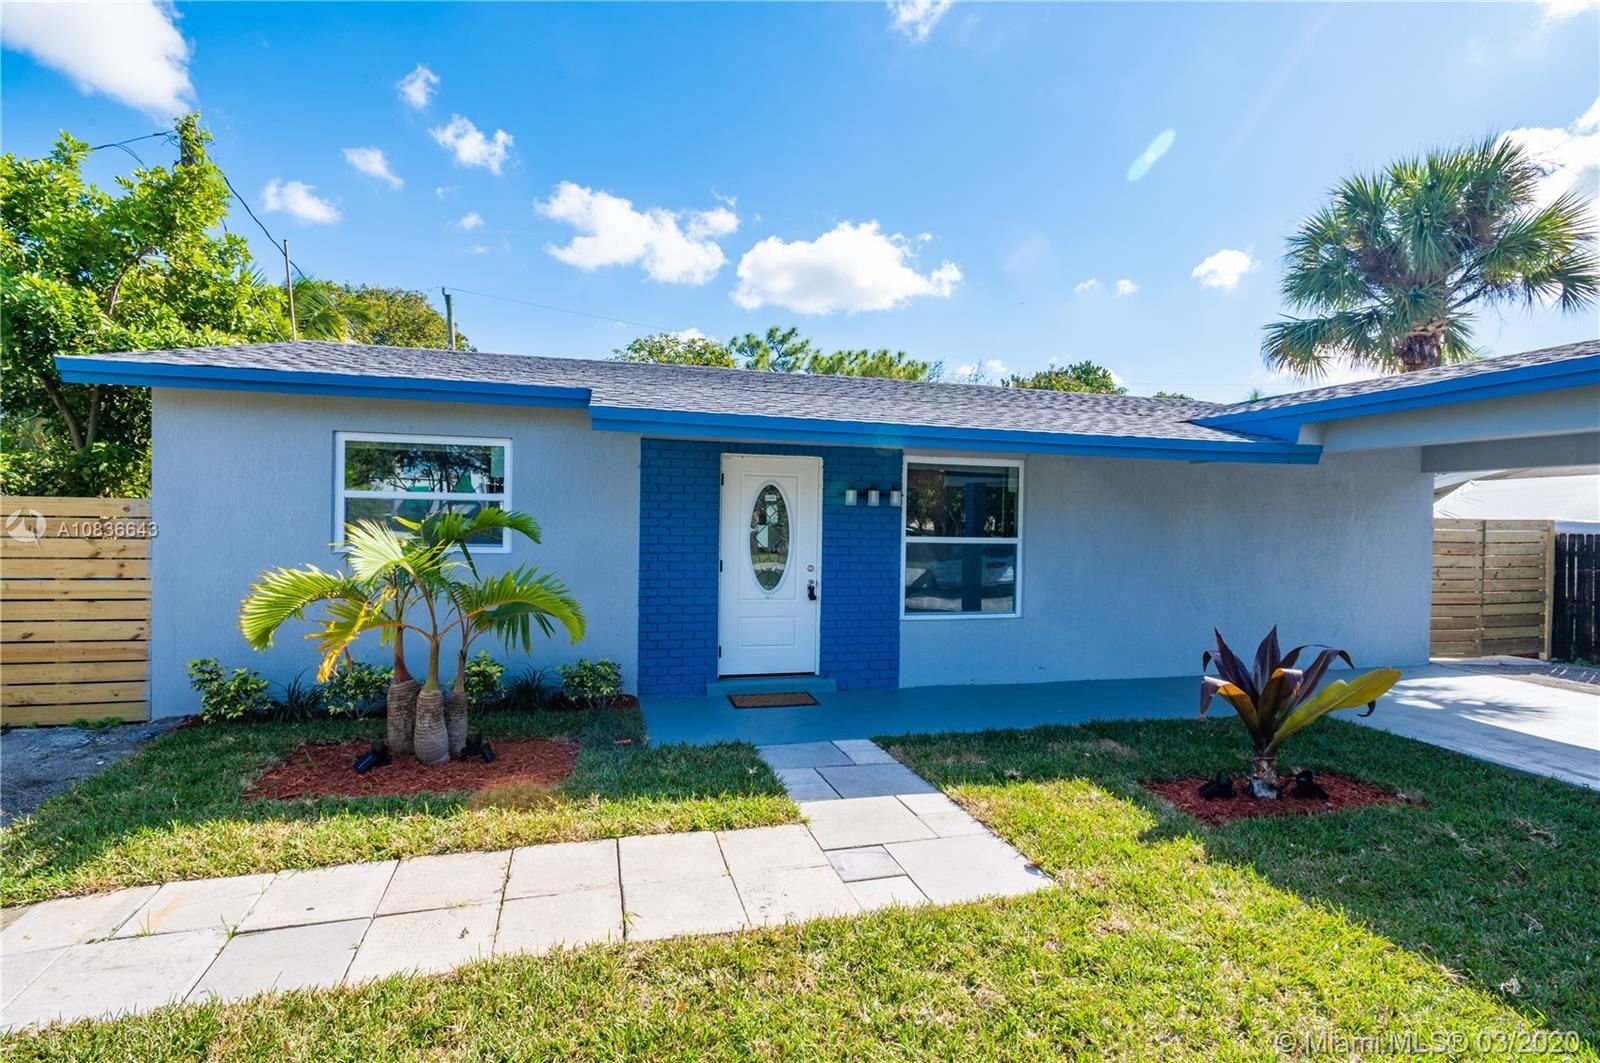 2624 SW 13th St, Fort Lauderdale, FL 33312 - #: A10836643